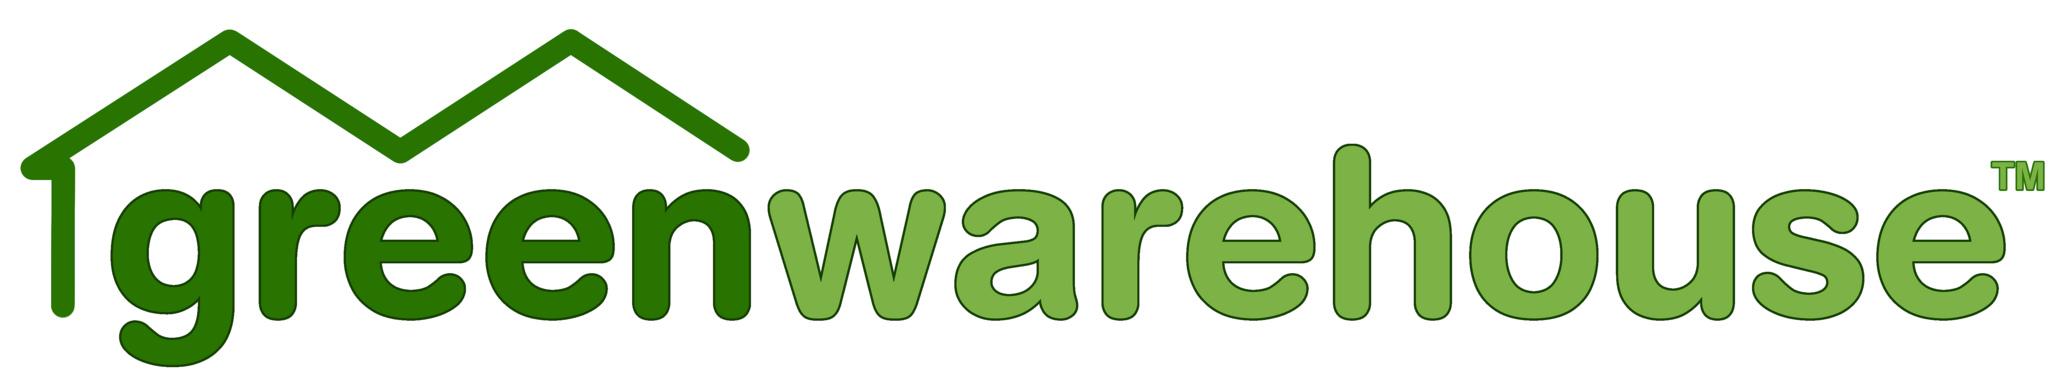 Greenwarehouse